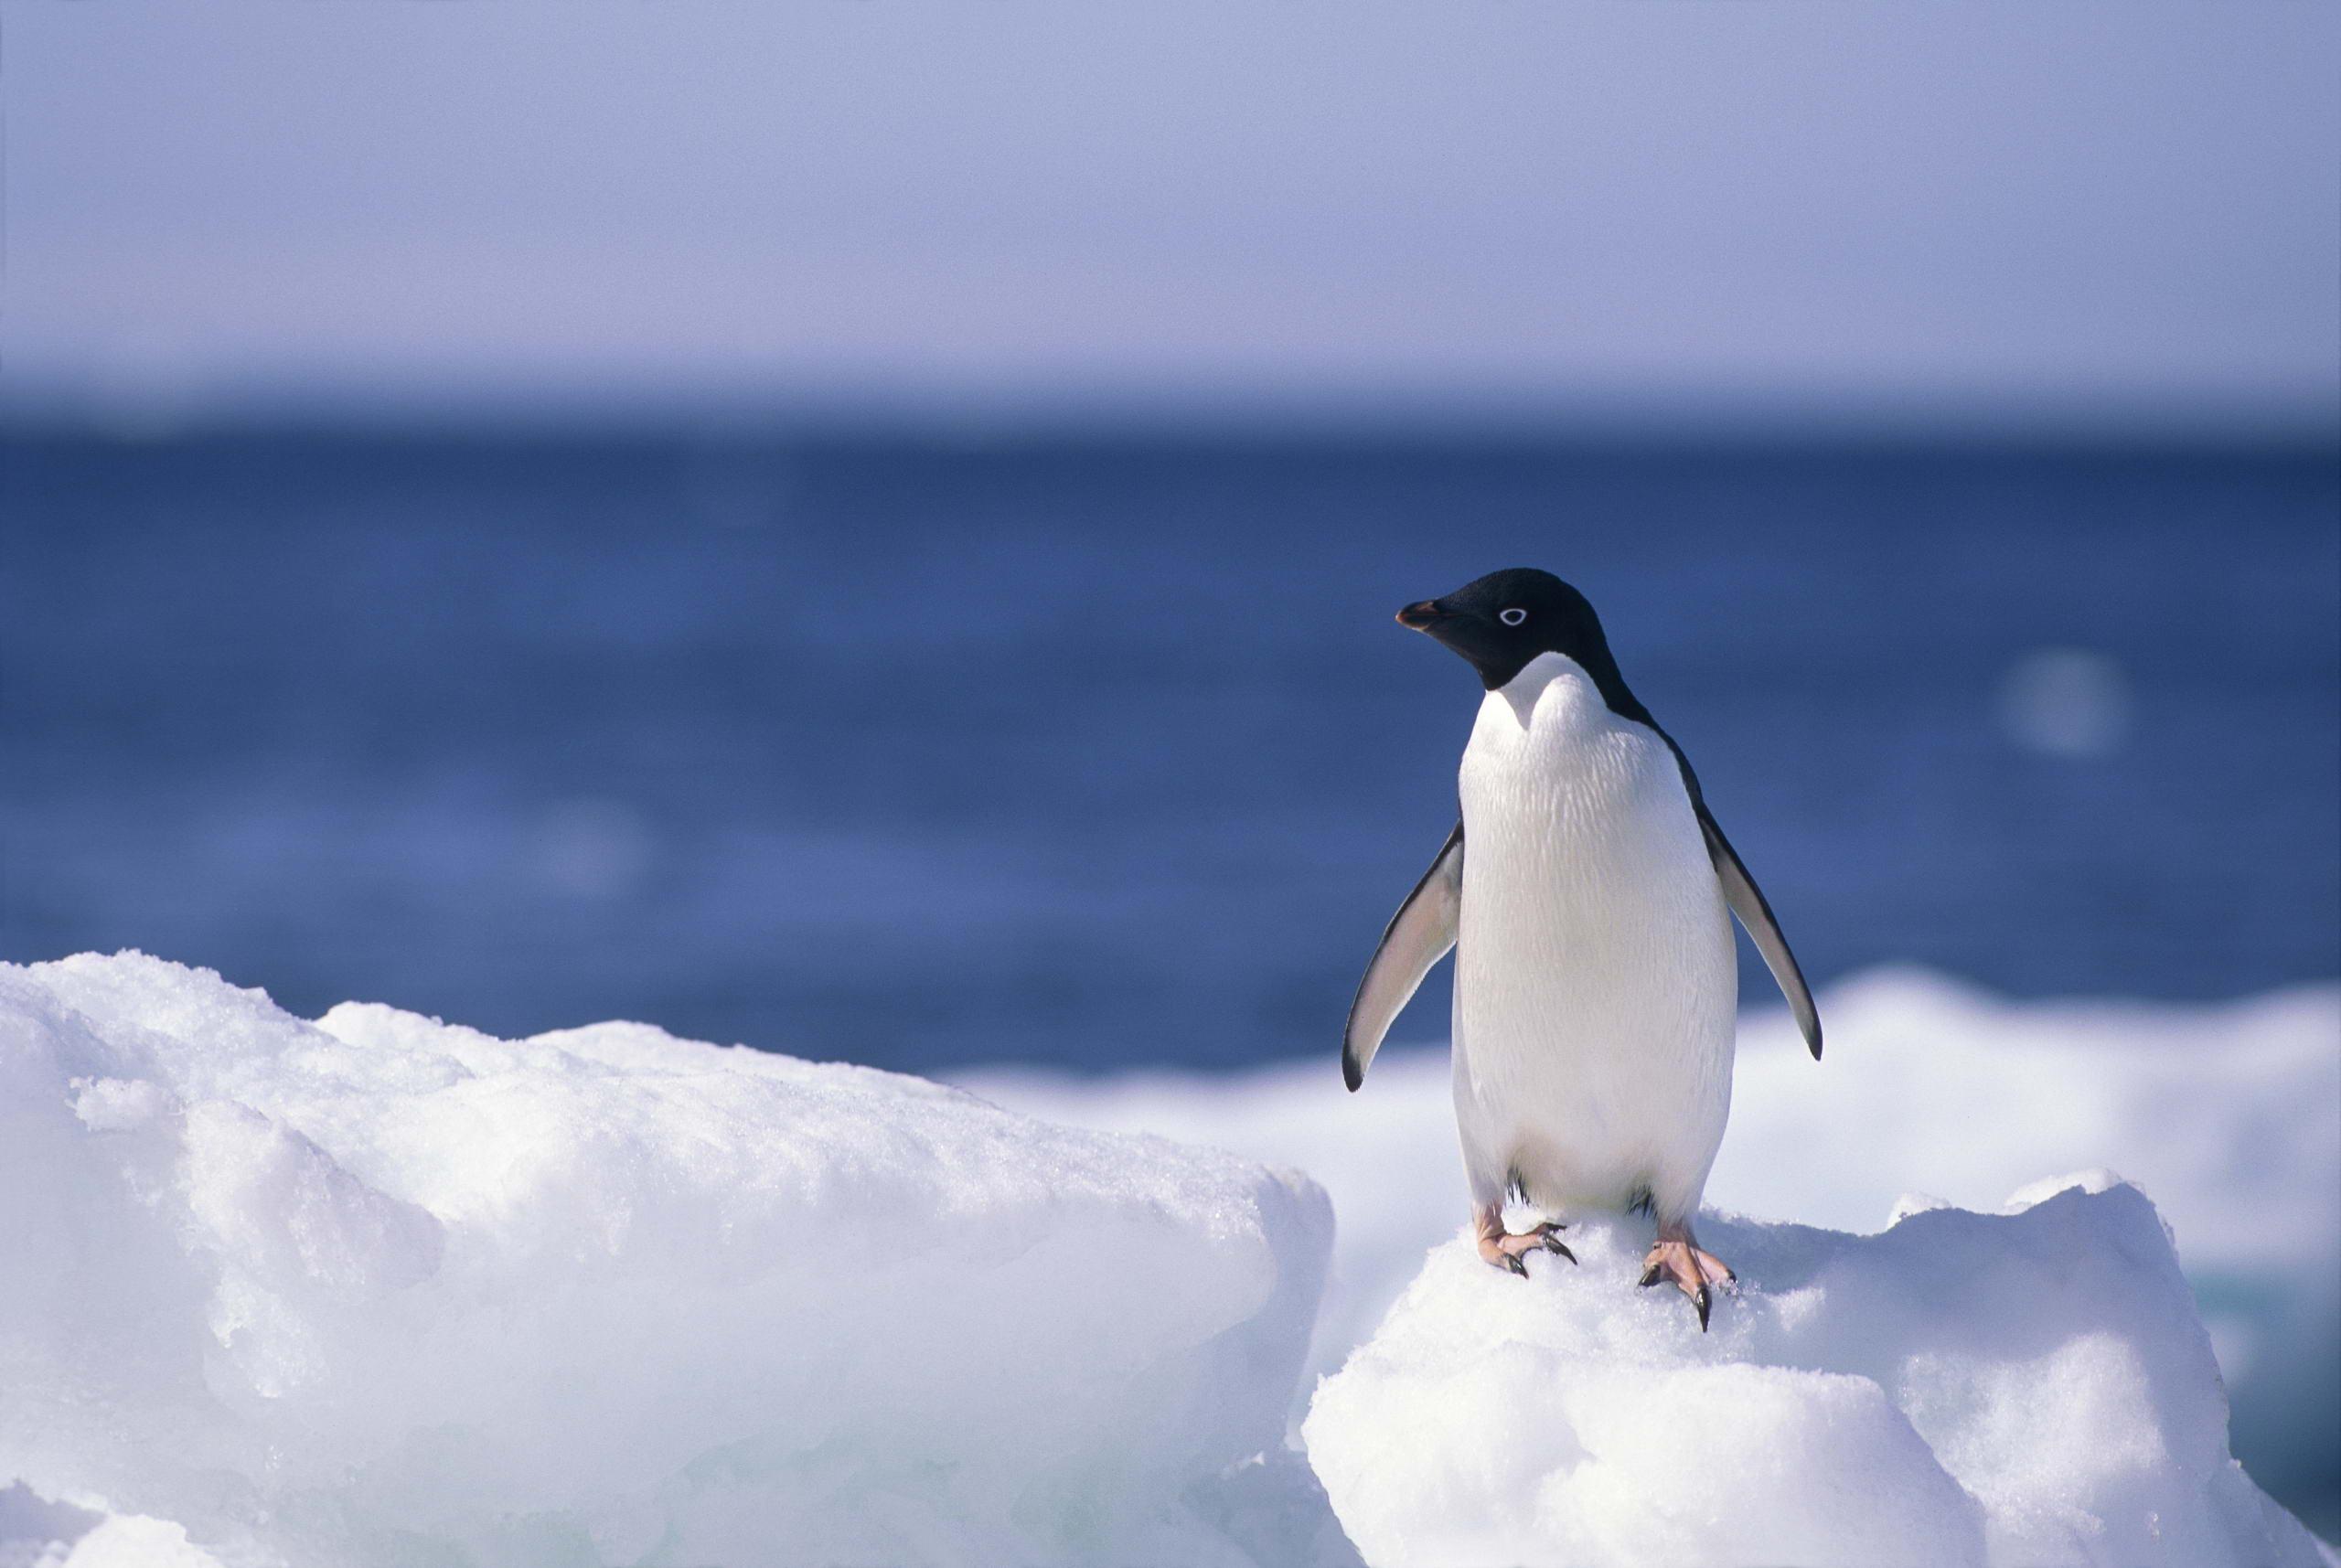 penguin wallpaper wallpapers - photo #40